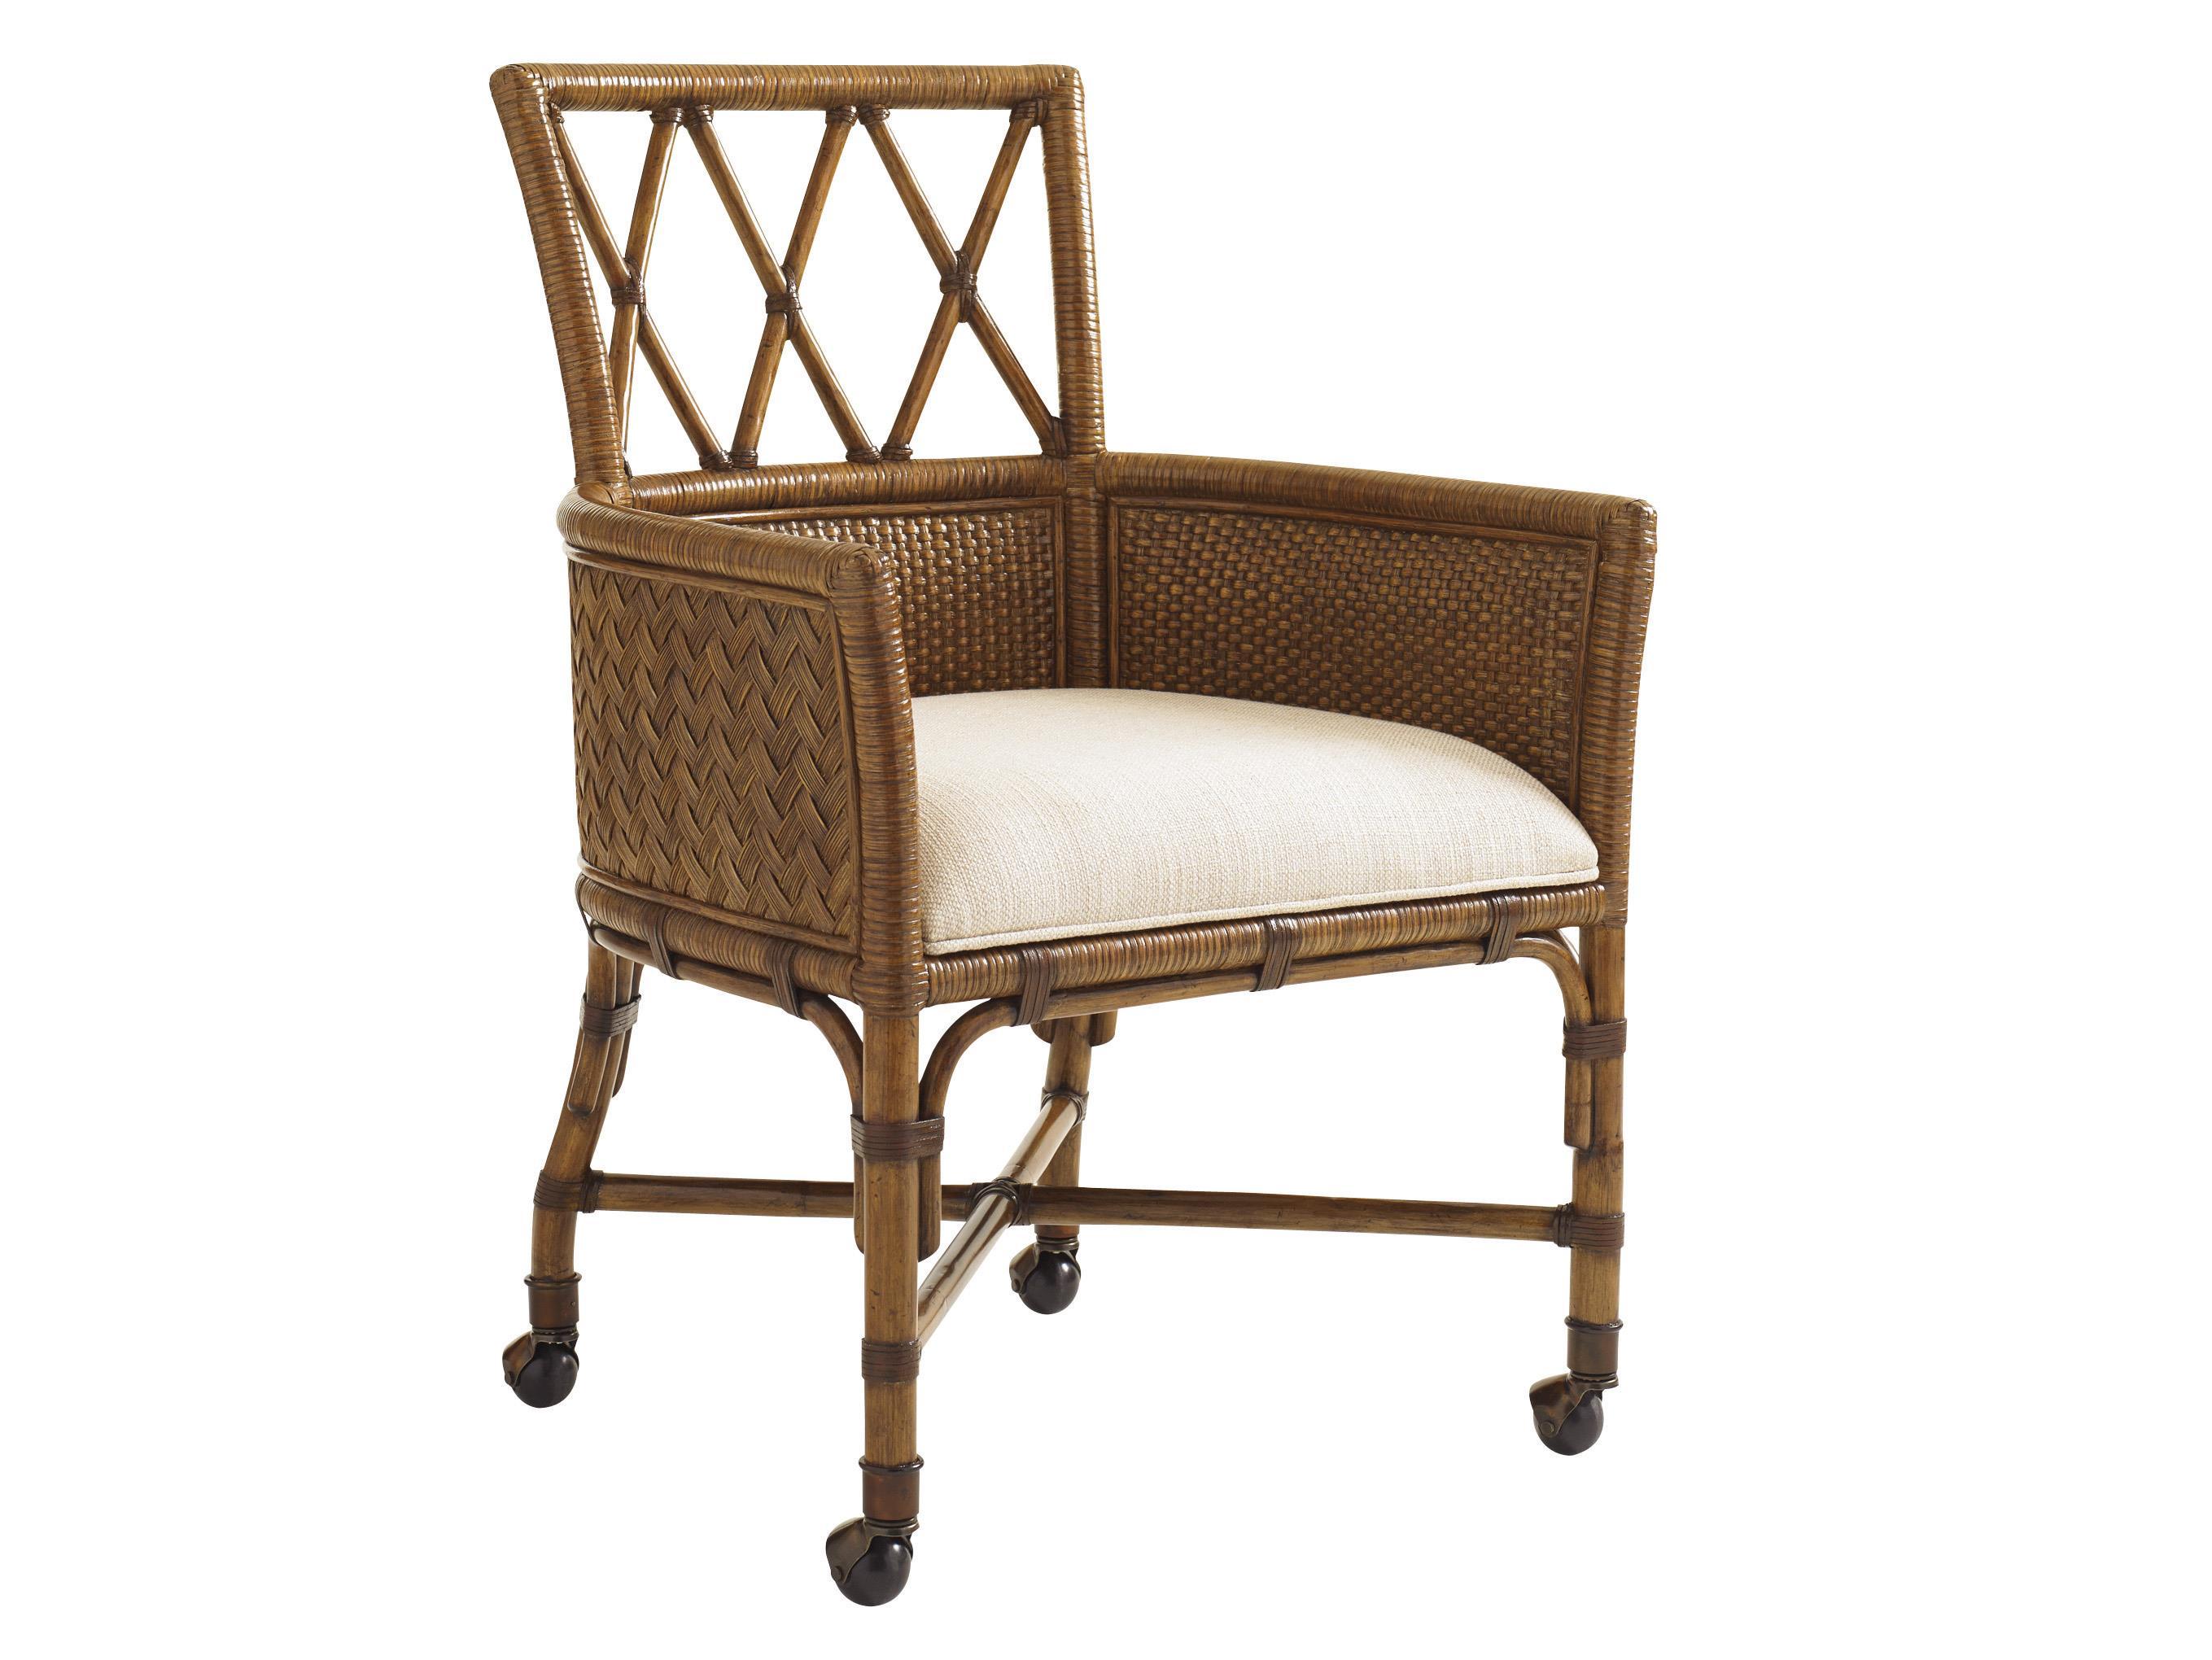 Bali Hai Customizable Tarpon Cove Game Chair by Tommy Bahama Home at Baer's Furniture